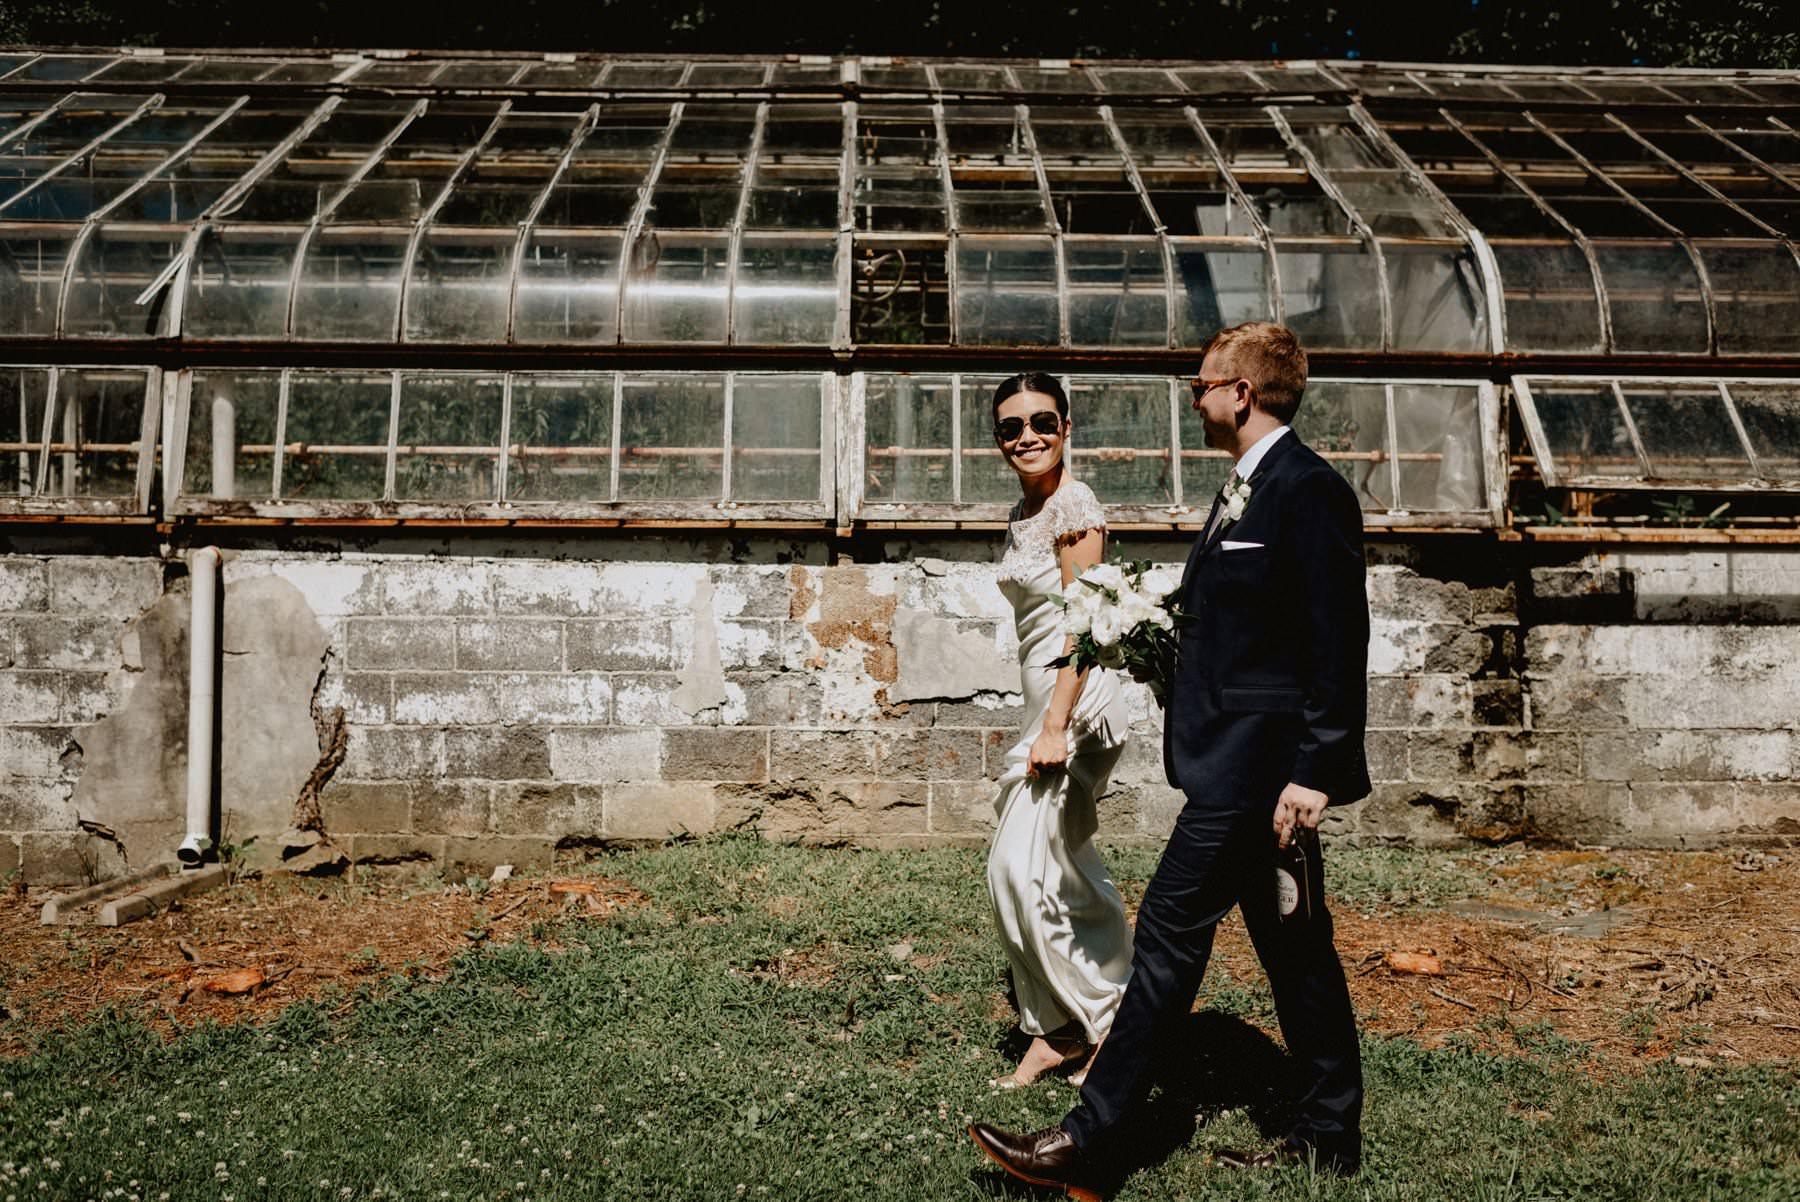 Appleford-estate-wedding-64.jpg